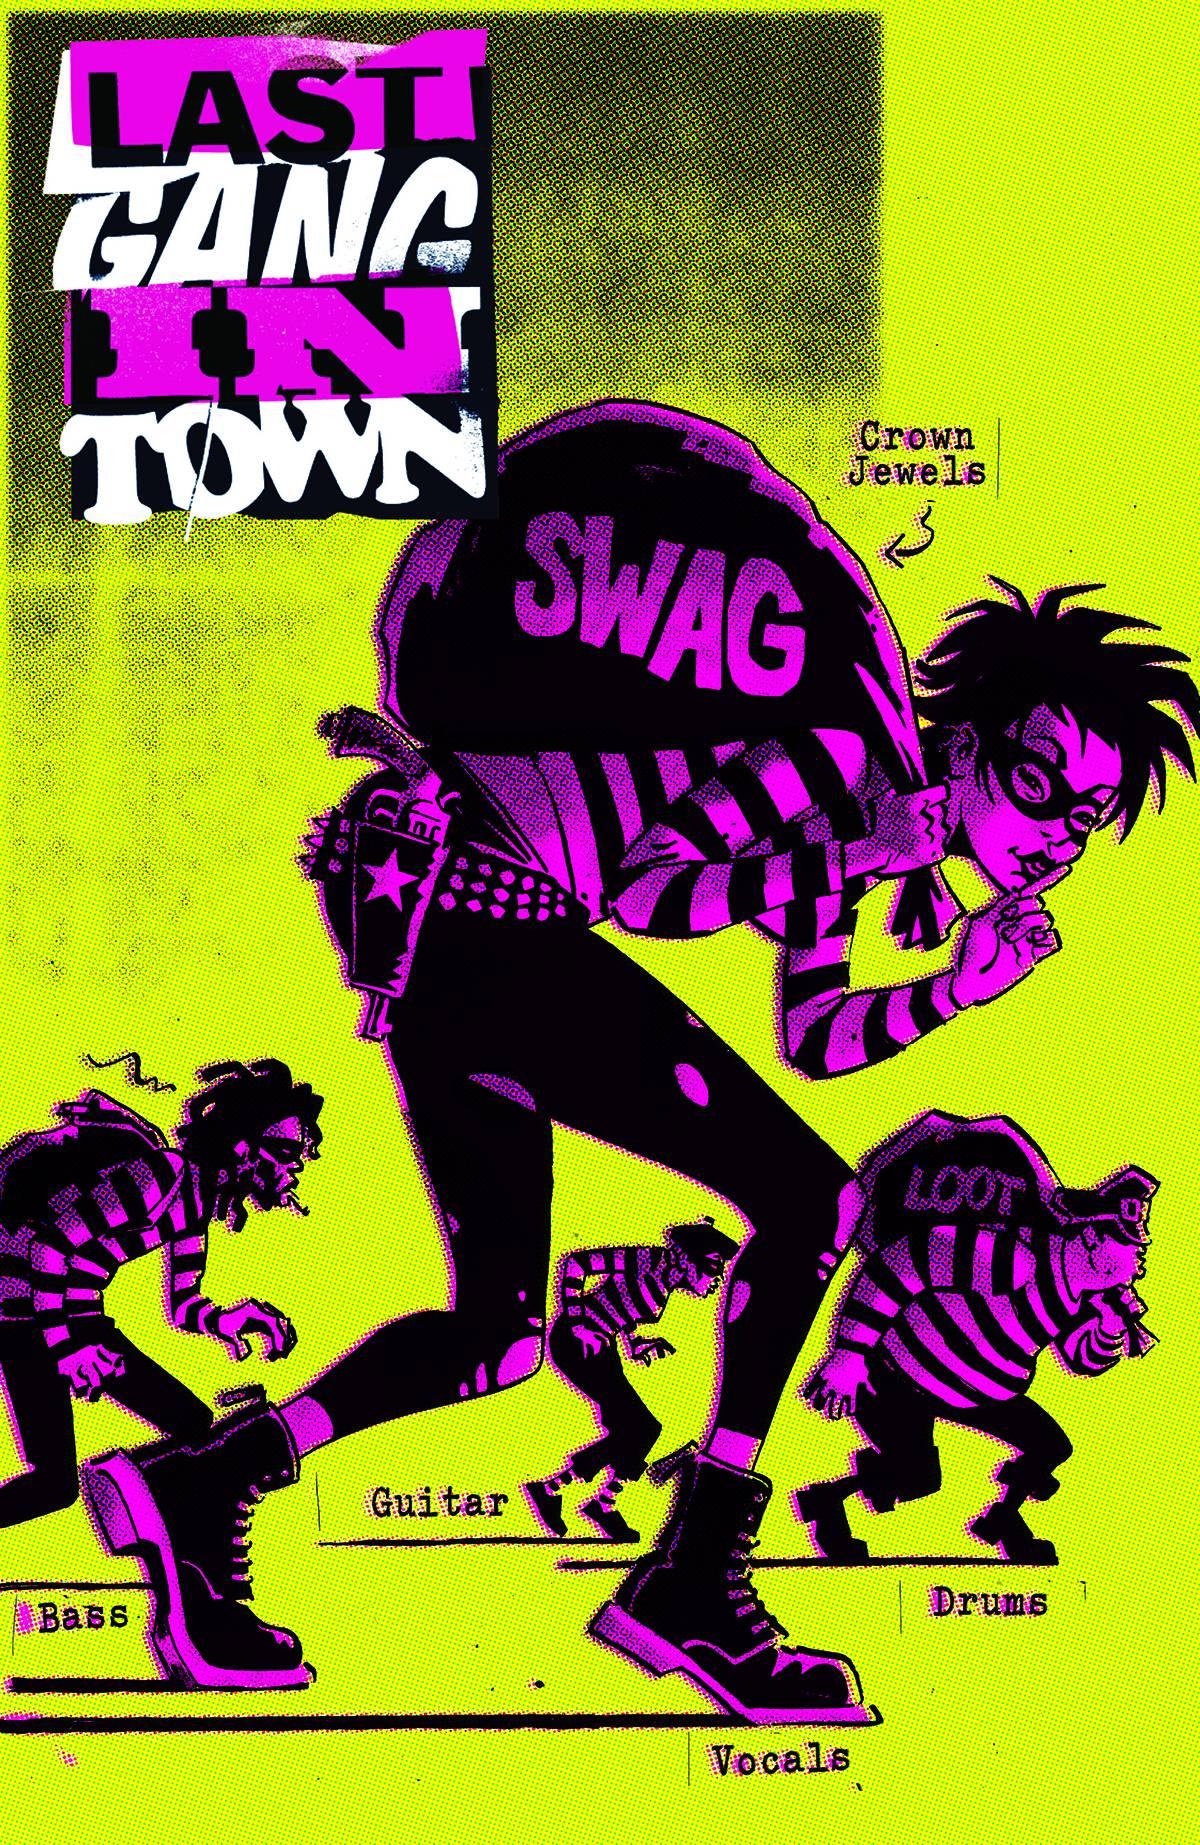 Cover Art by Rob Davis